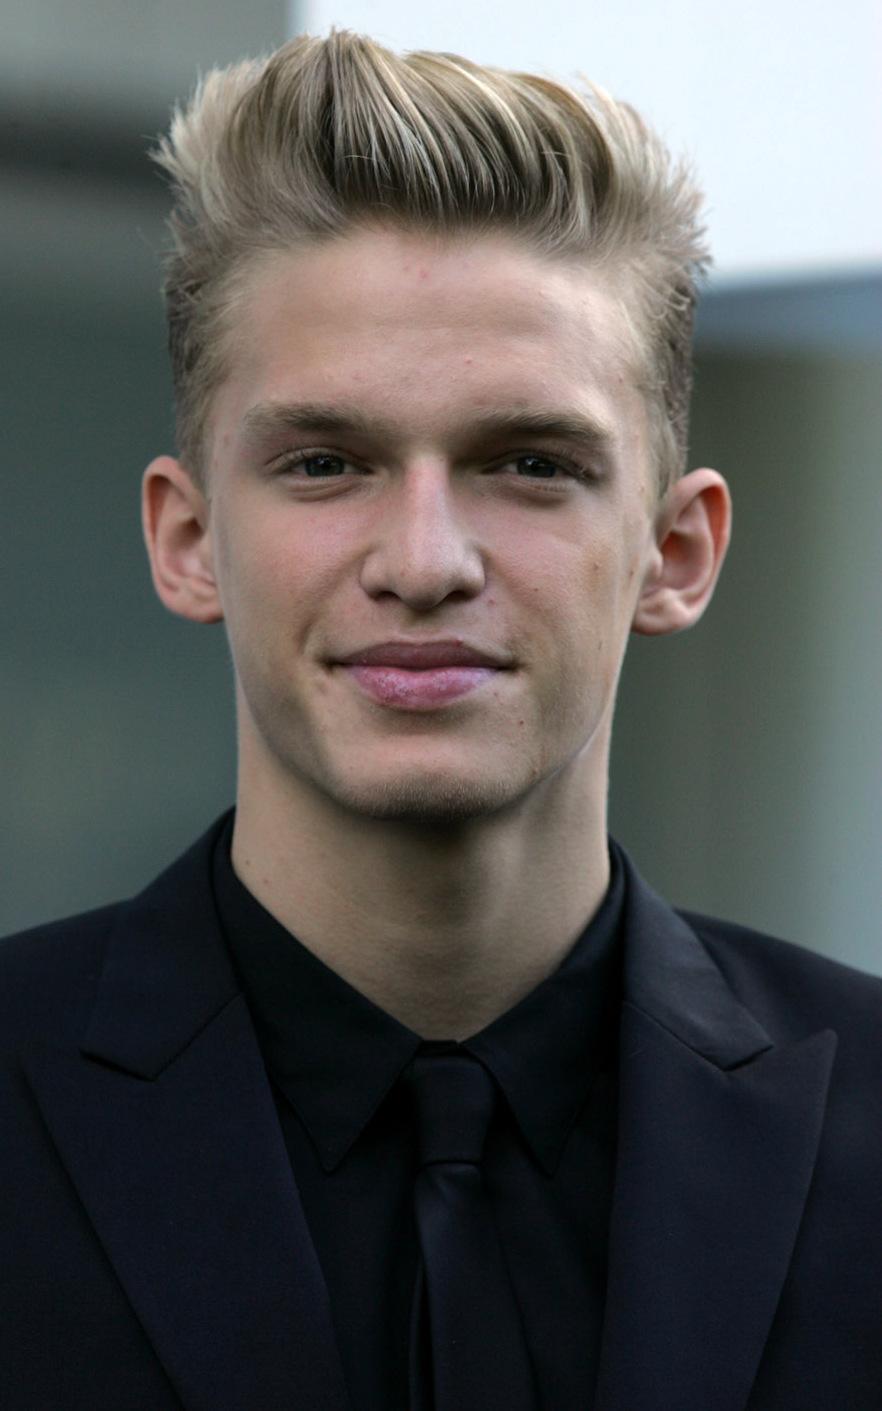 Cody Simpson Wikipedia